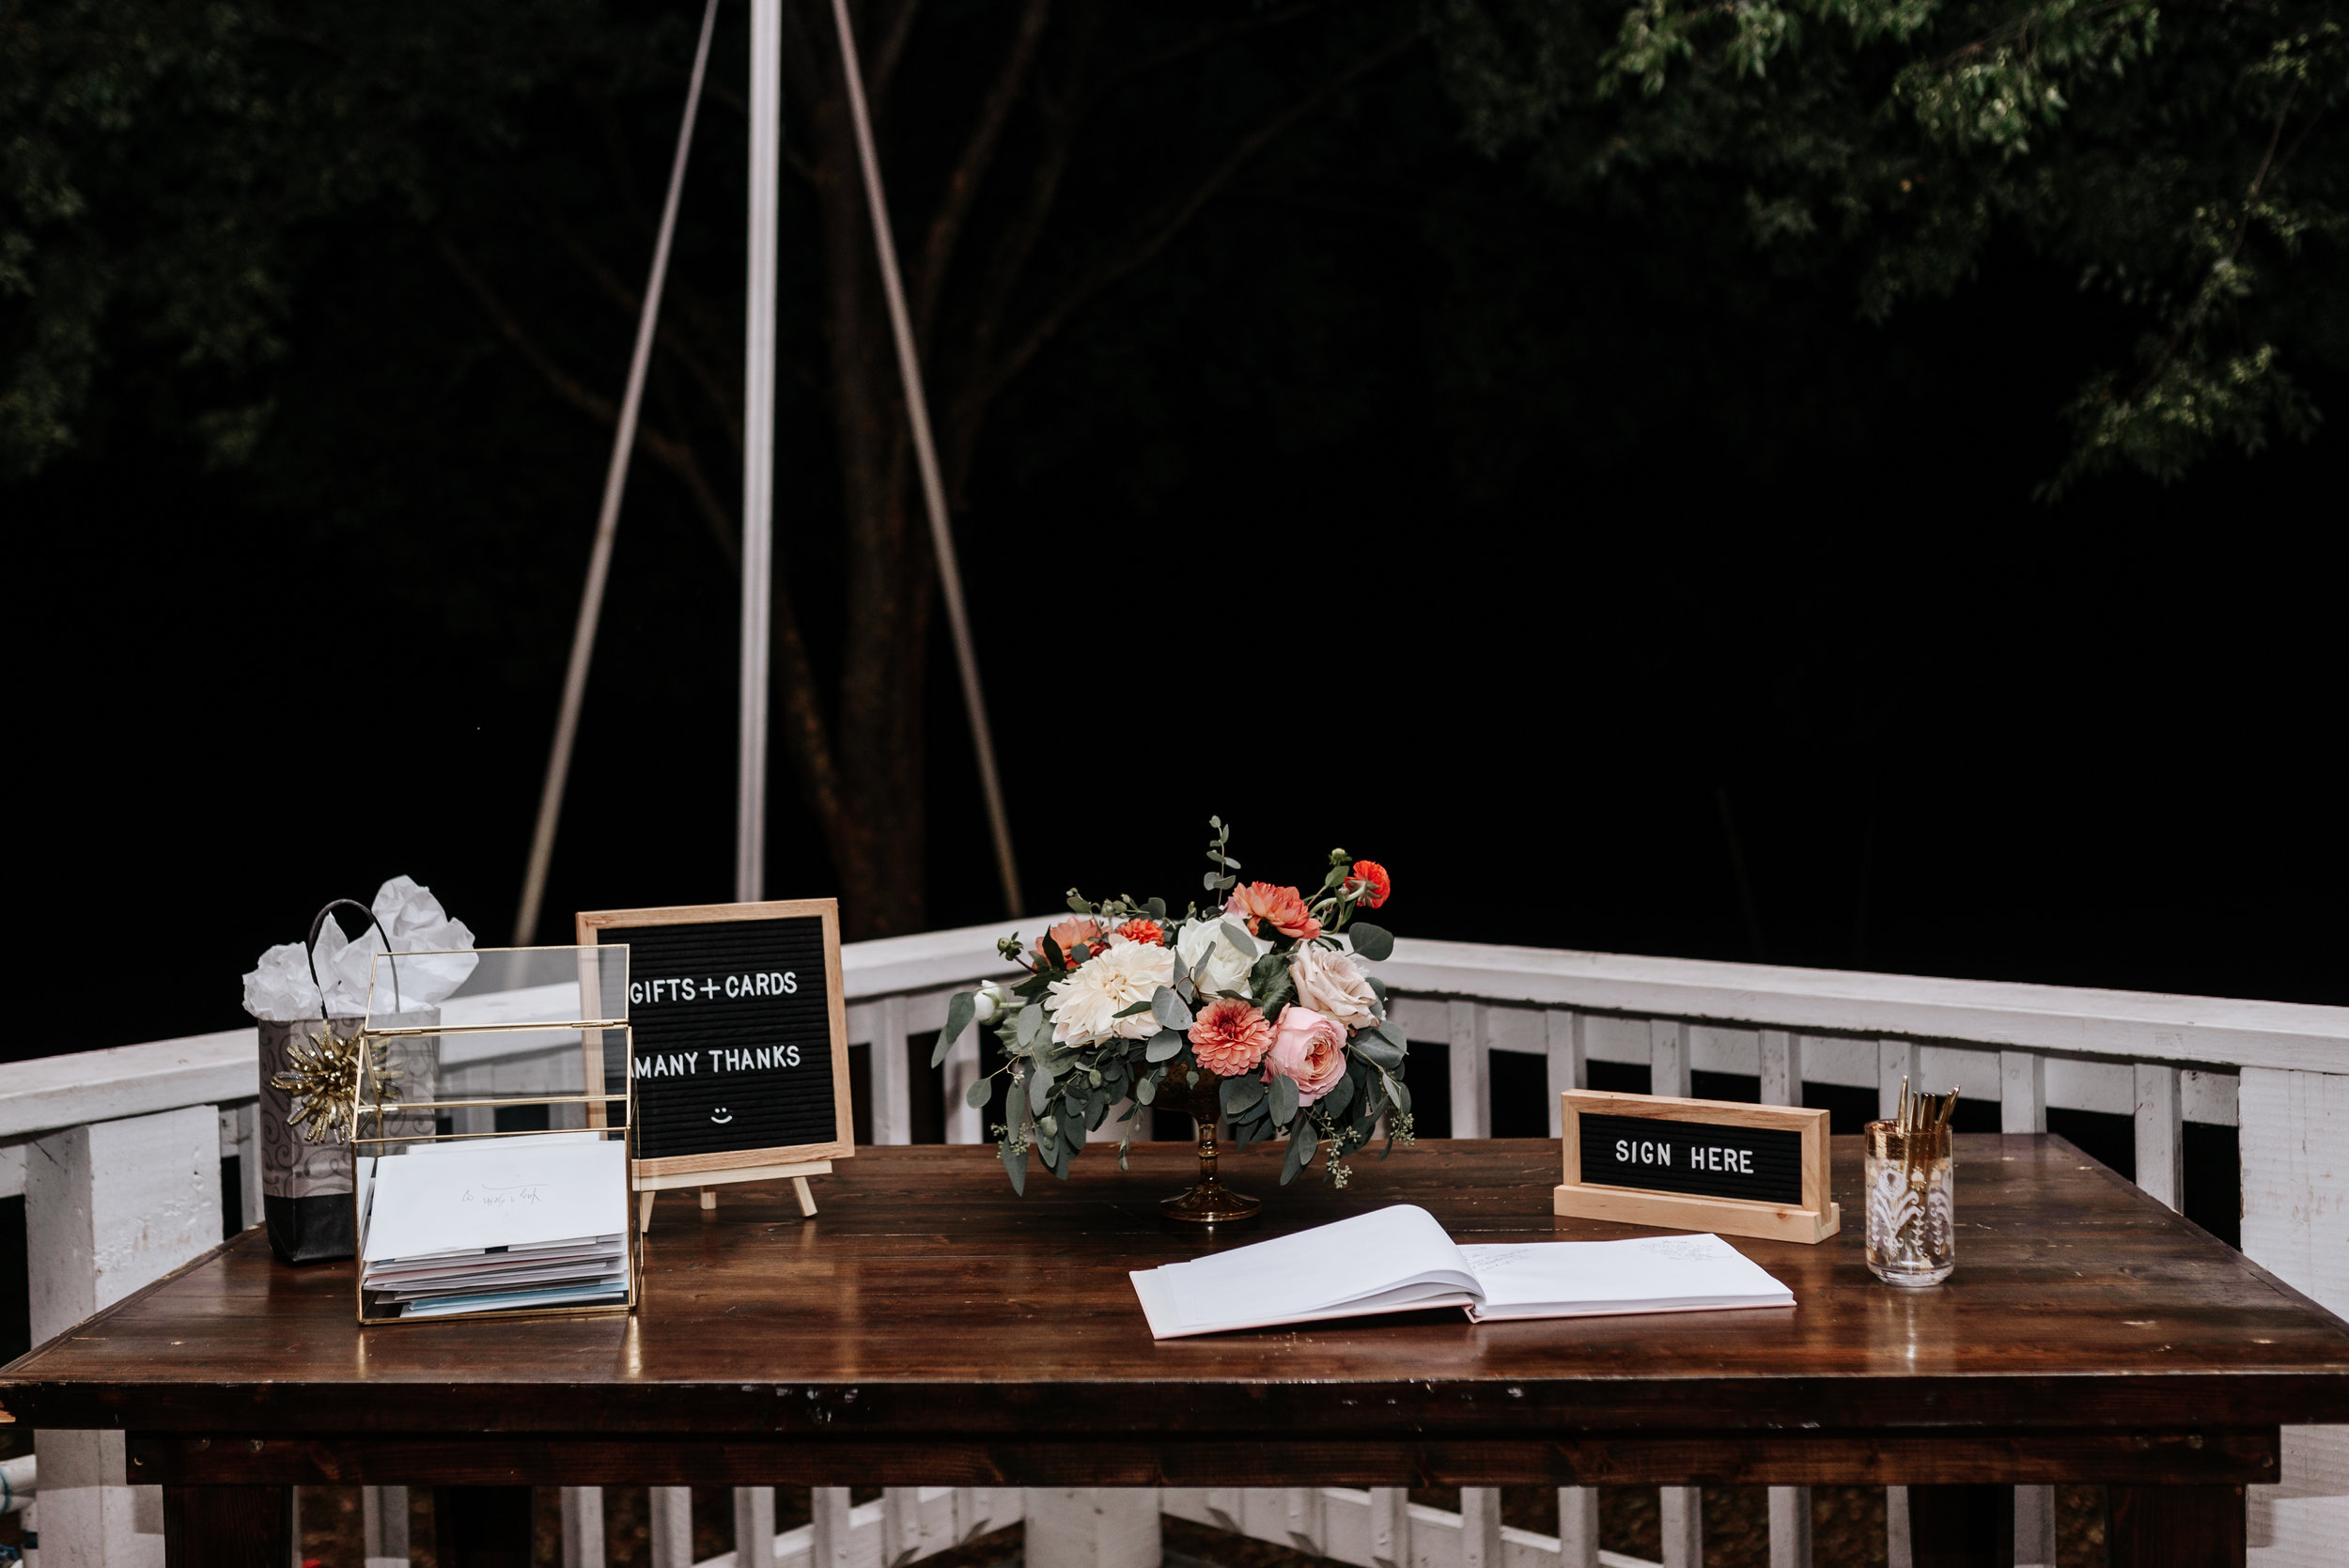 Veritas-Vineyards-and-Winery-Wedding-Photography-Afton-Virginia-Yasmin-Seth-Photography-by-V-9832.jpg